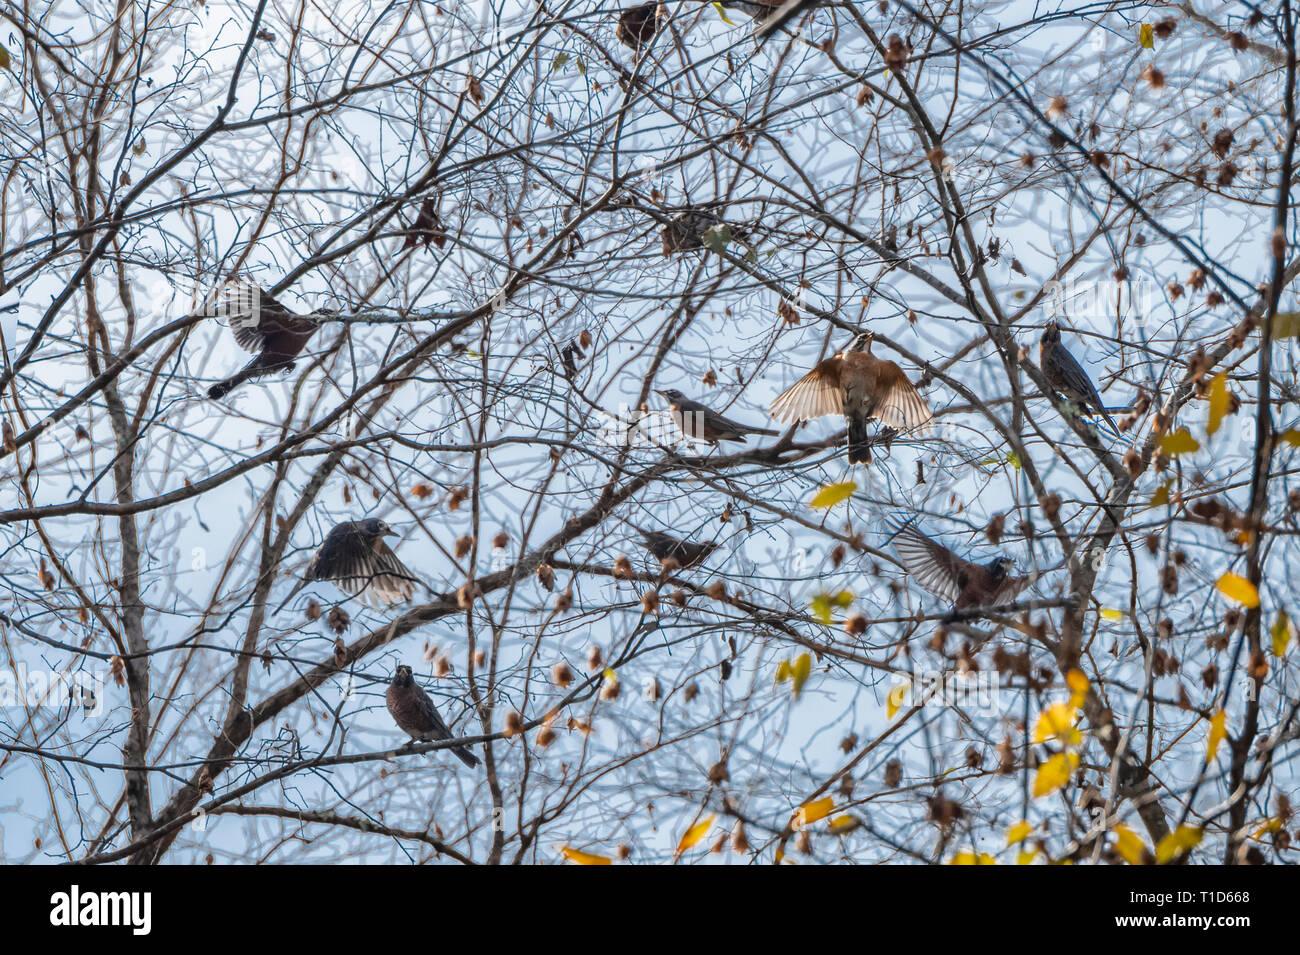 Flock of migrating Robin birds in budding winter tree - Stock Image